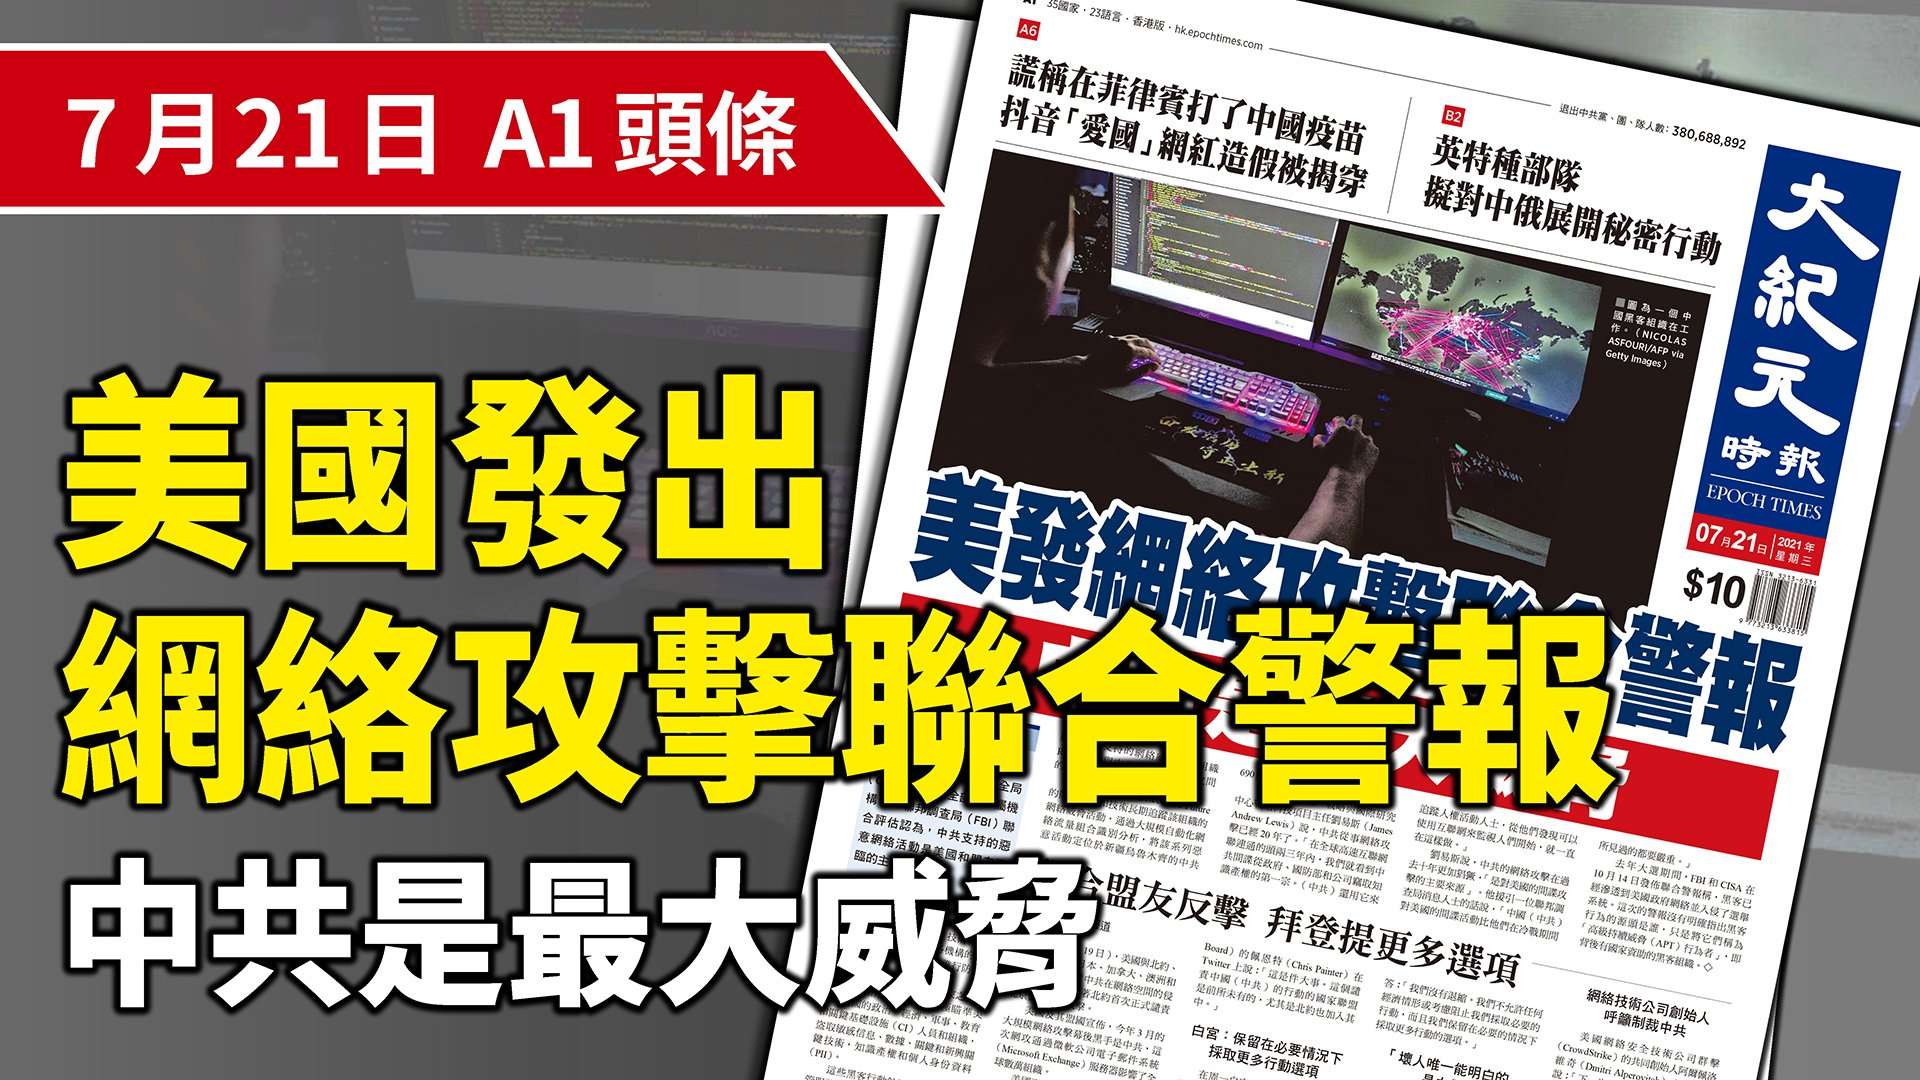 圖為一個中國黑客組織在工作。(NICOLA SASFOURI/AFP via Getty Images)